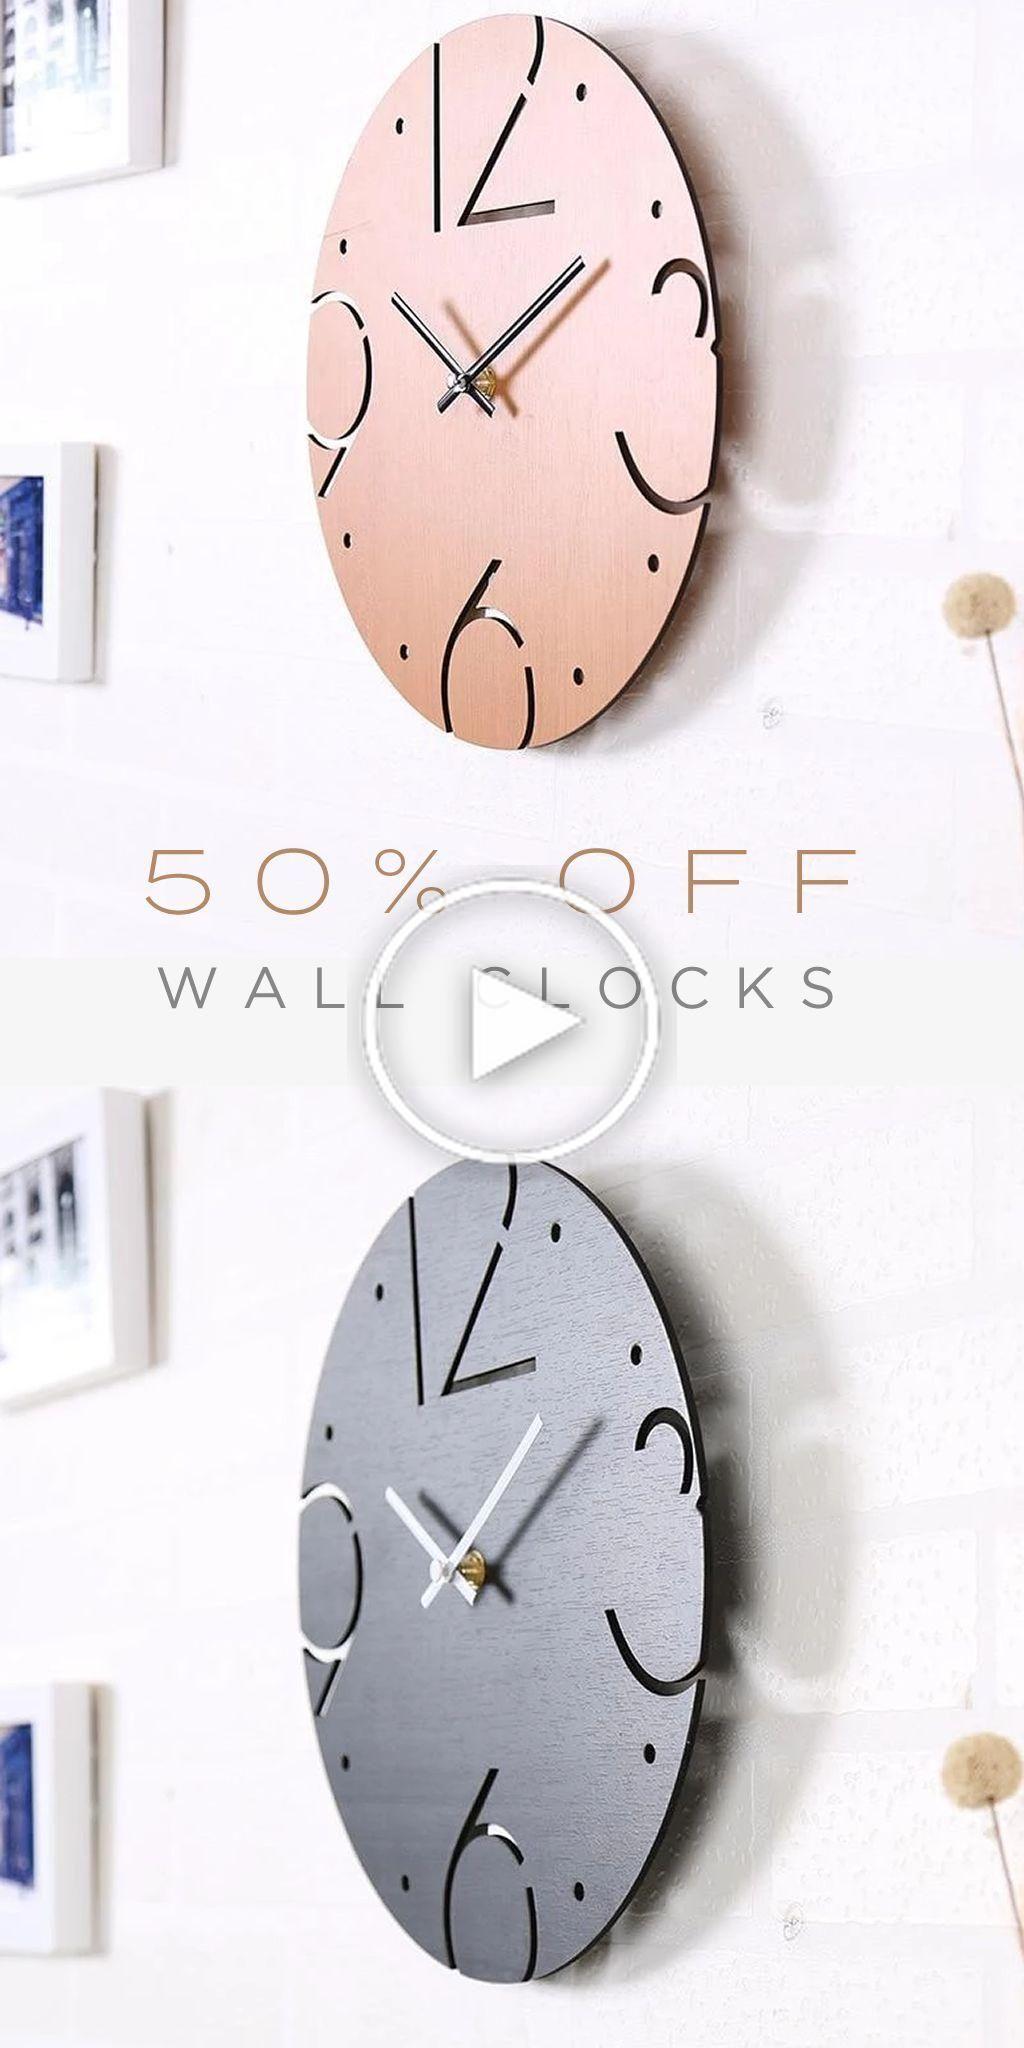 50 Rabatt Auf Moderne Wanduhr Modernebadezimmer Badezimmerideen Relojes De Pared Joyas De Cemento Remodelacion Del Bano